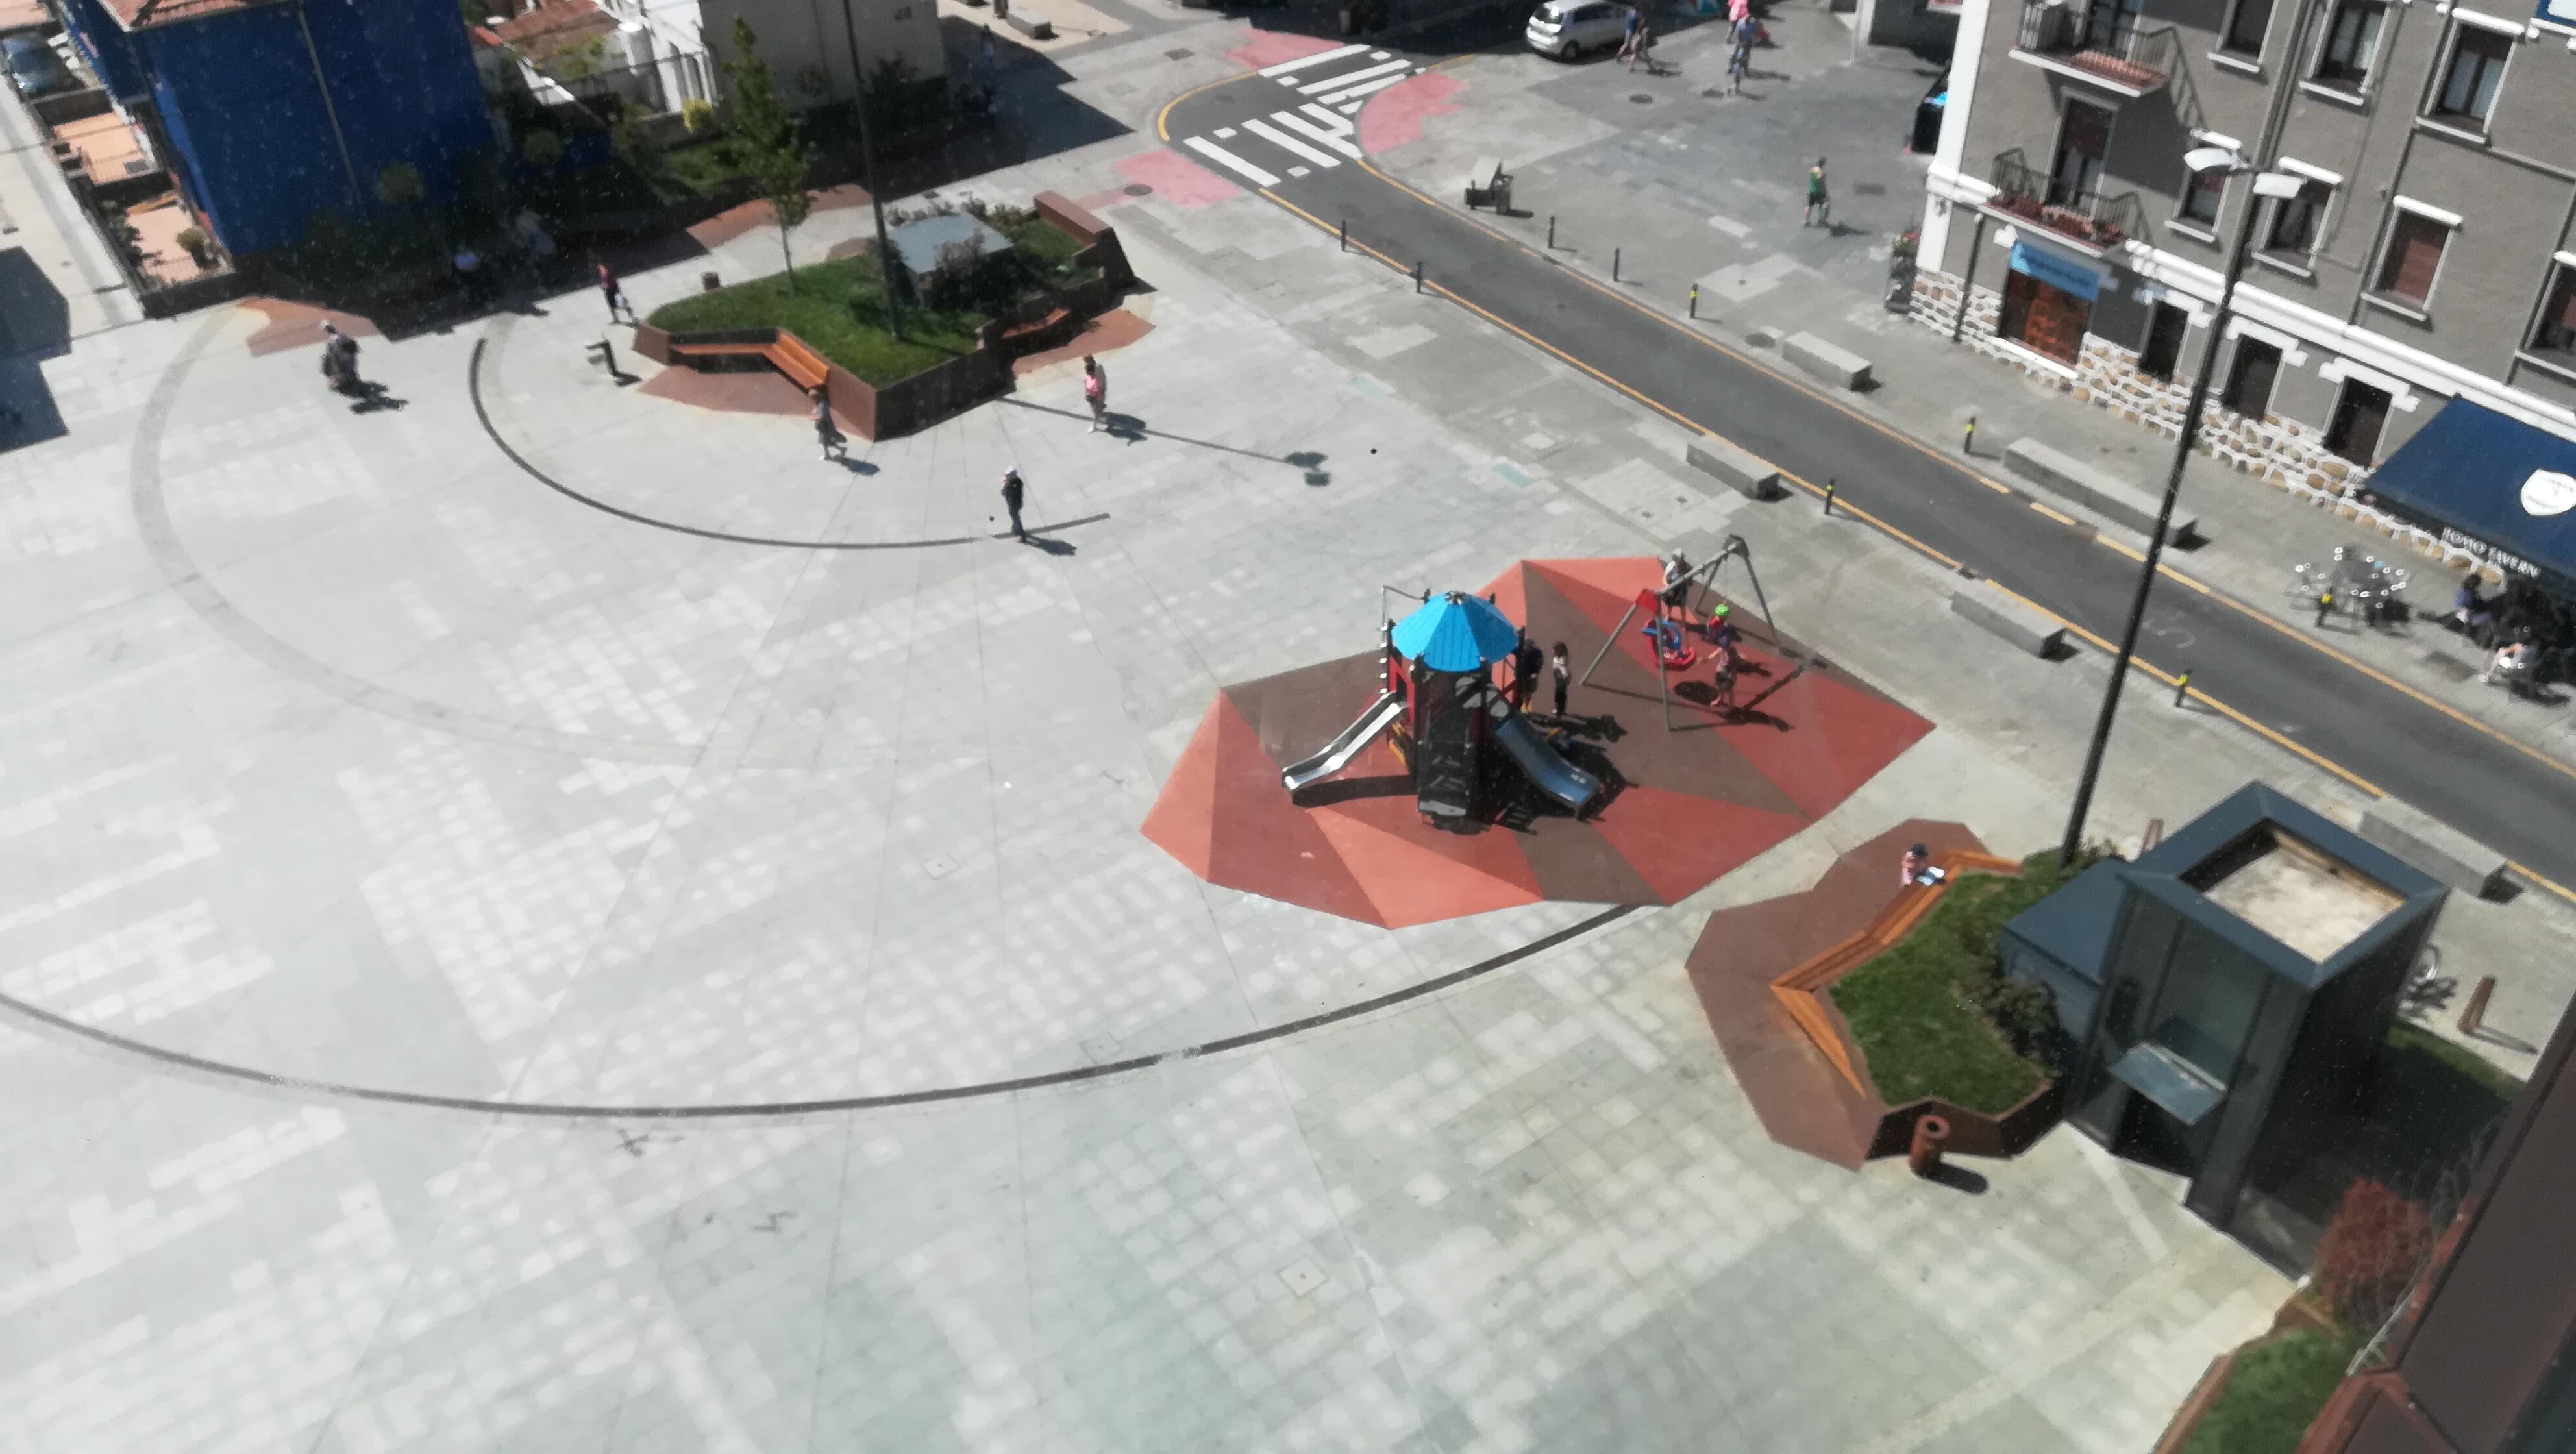 Plaza Sta Eugenia